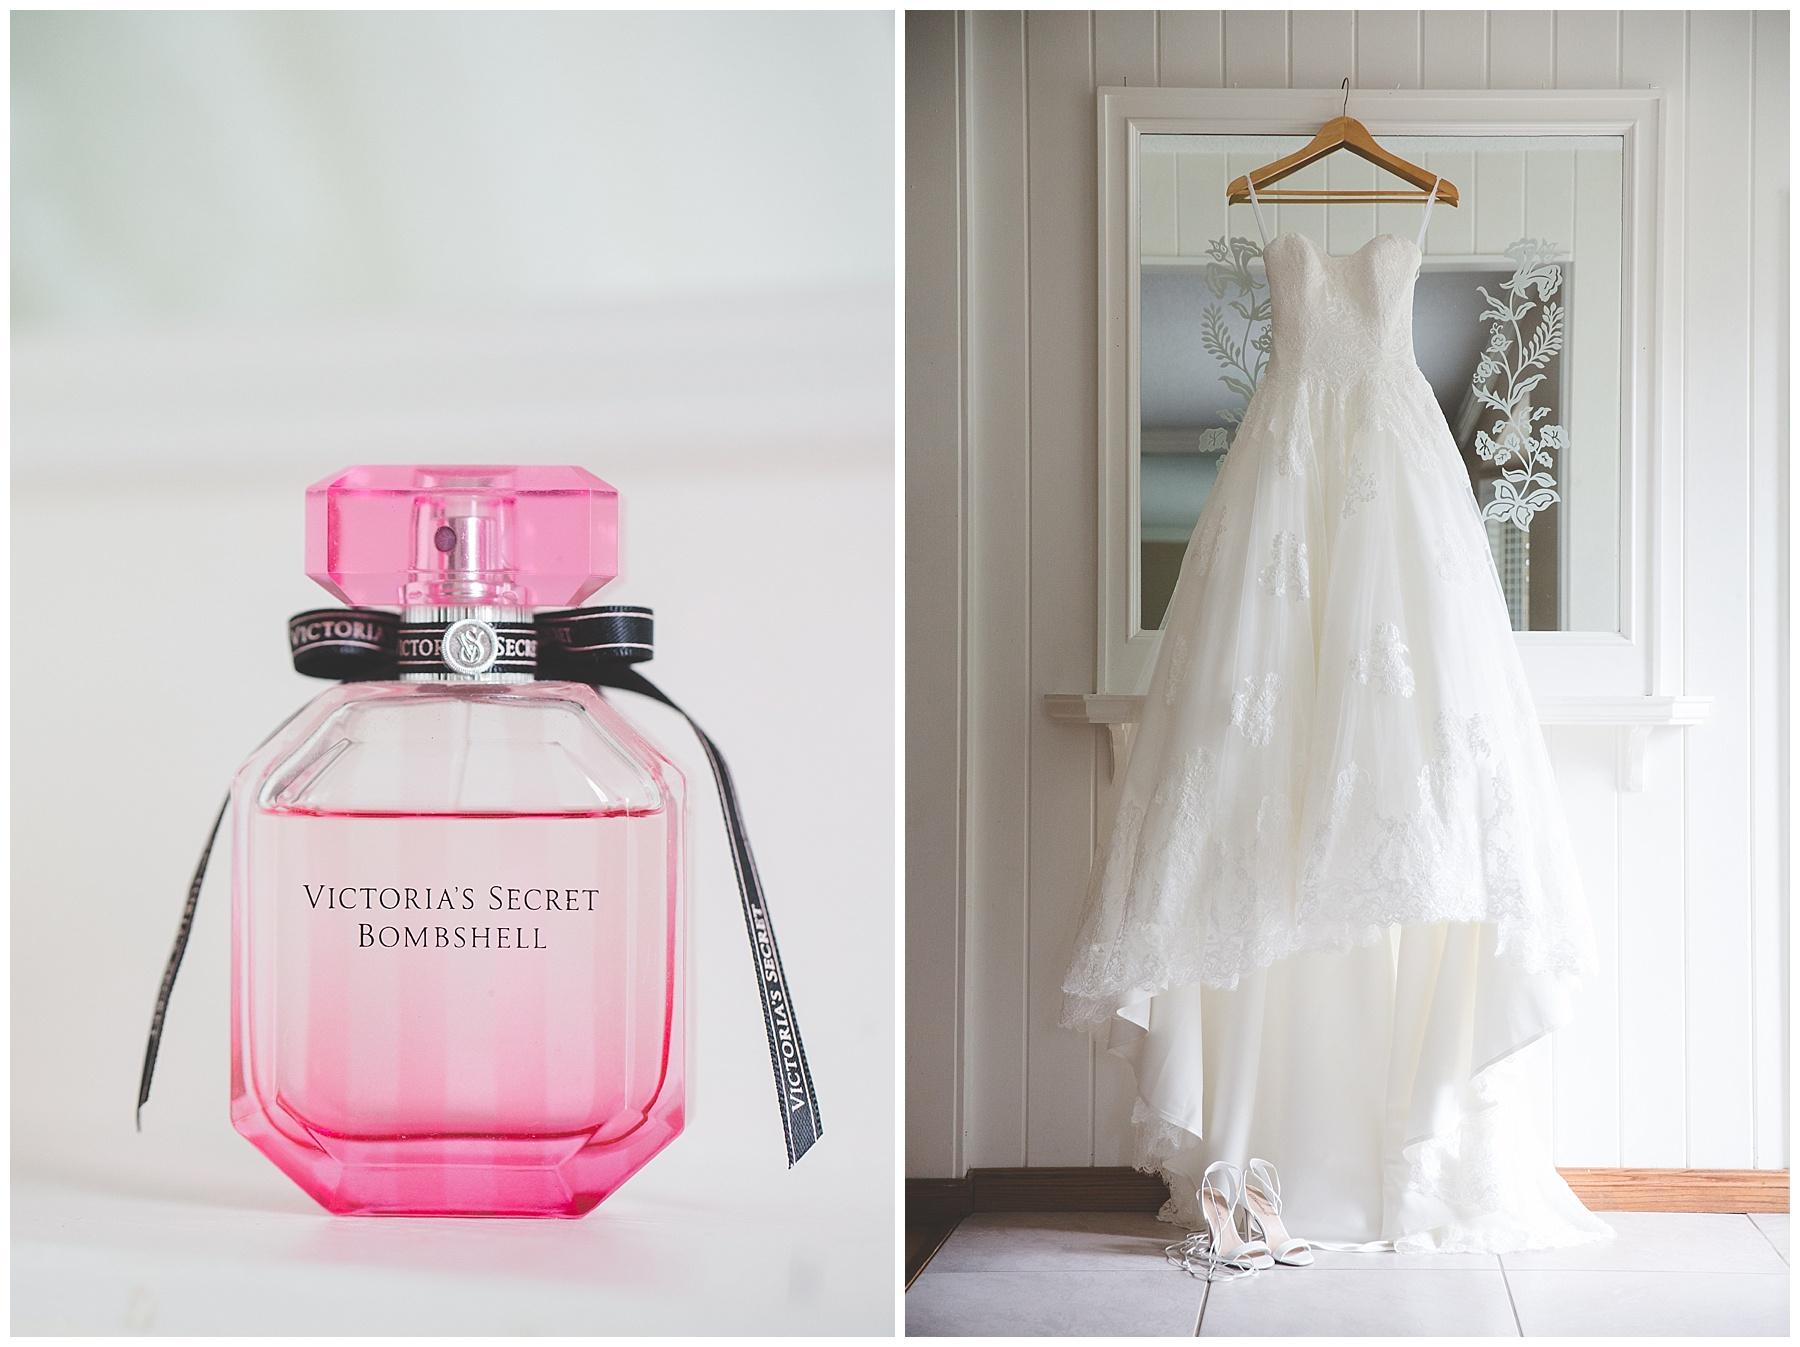 Calgary Bridal Details - Wedding Dress & perfume bottle